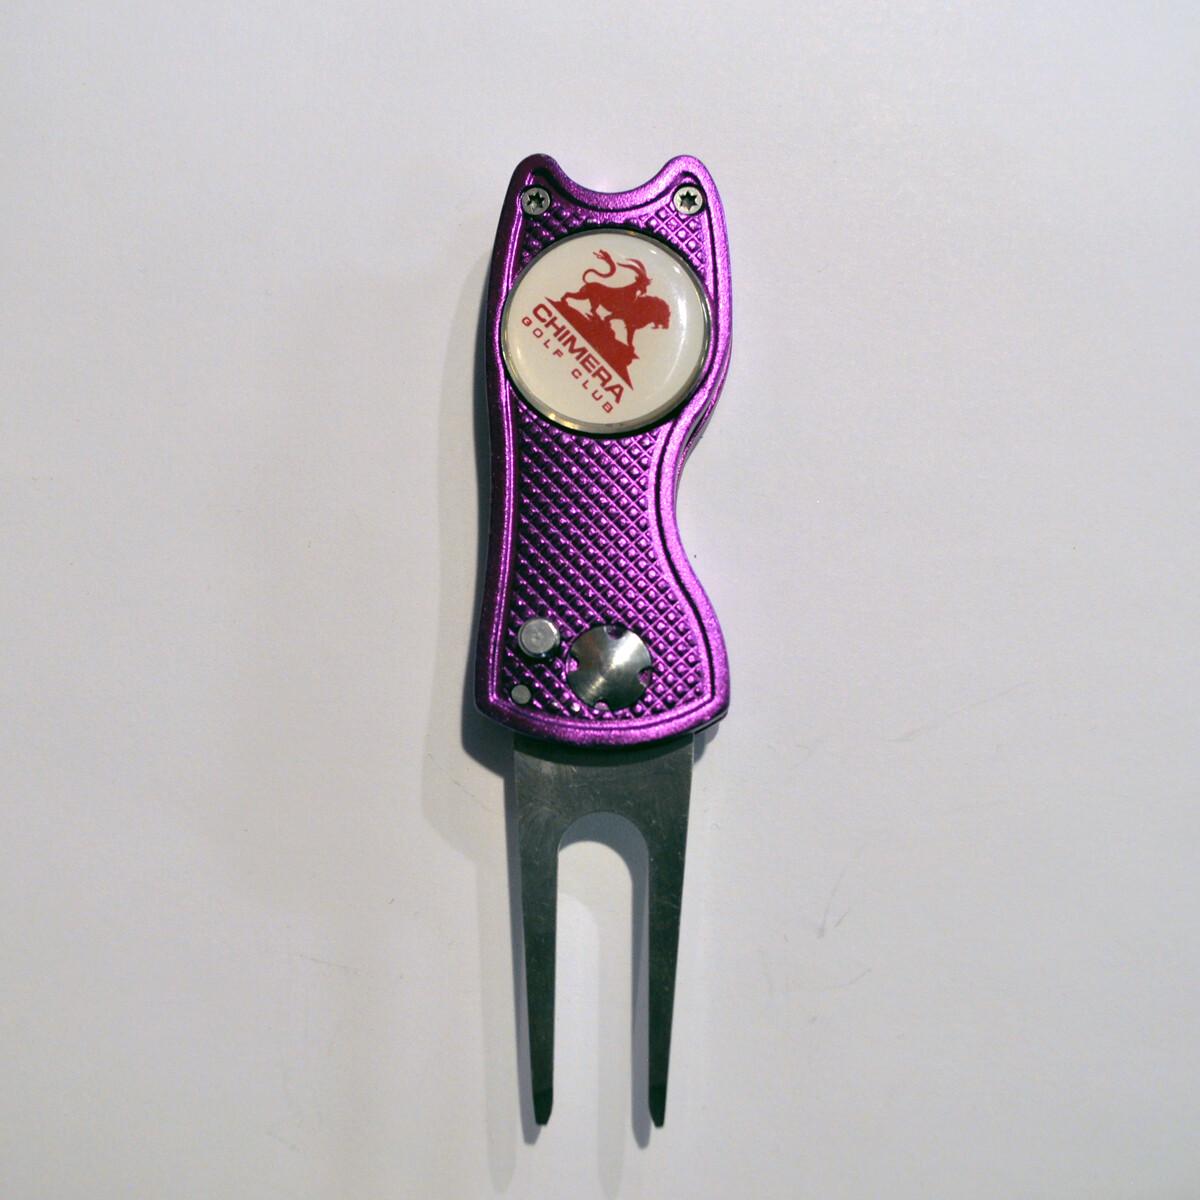 Switchblade Divot Tool - American Golf Gear - Purple